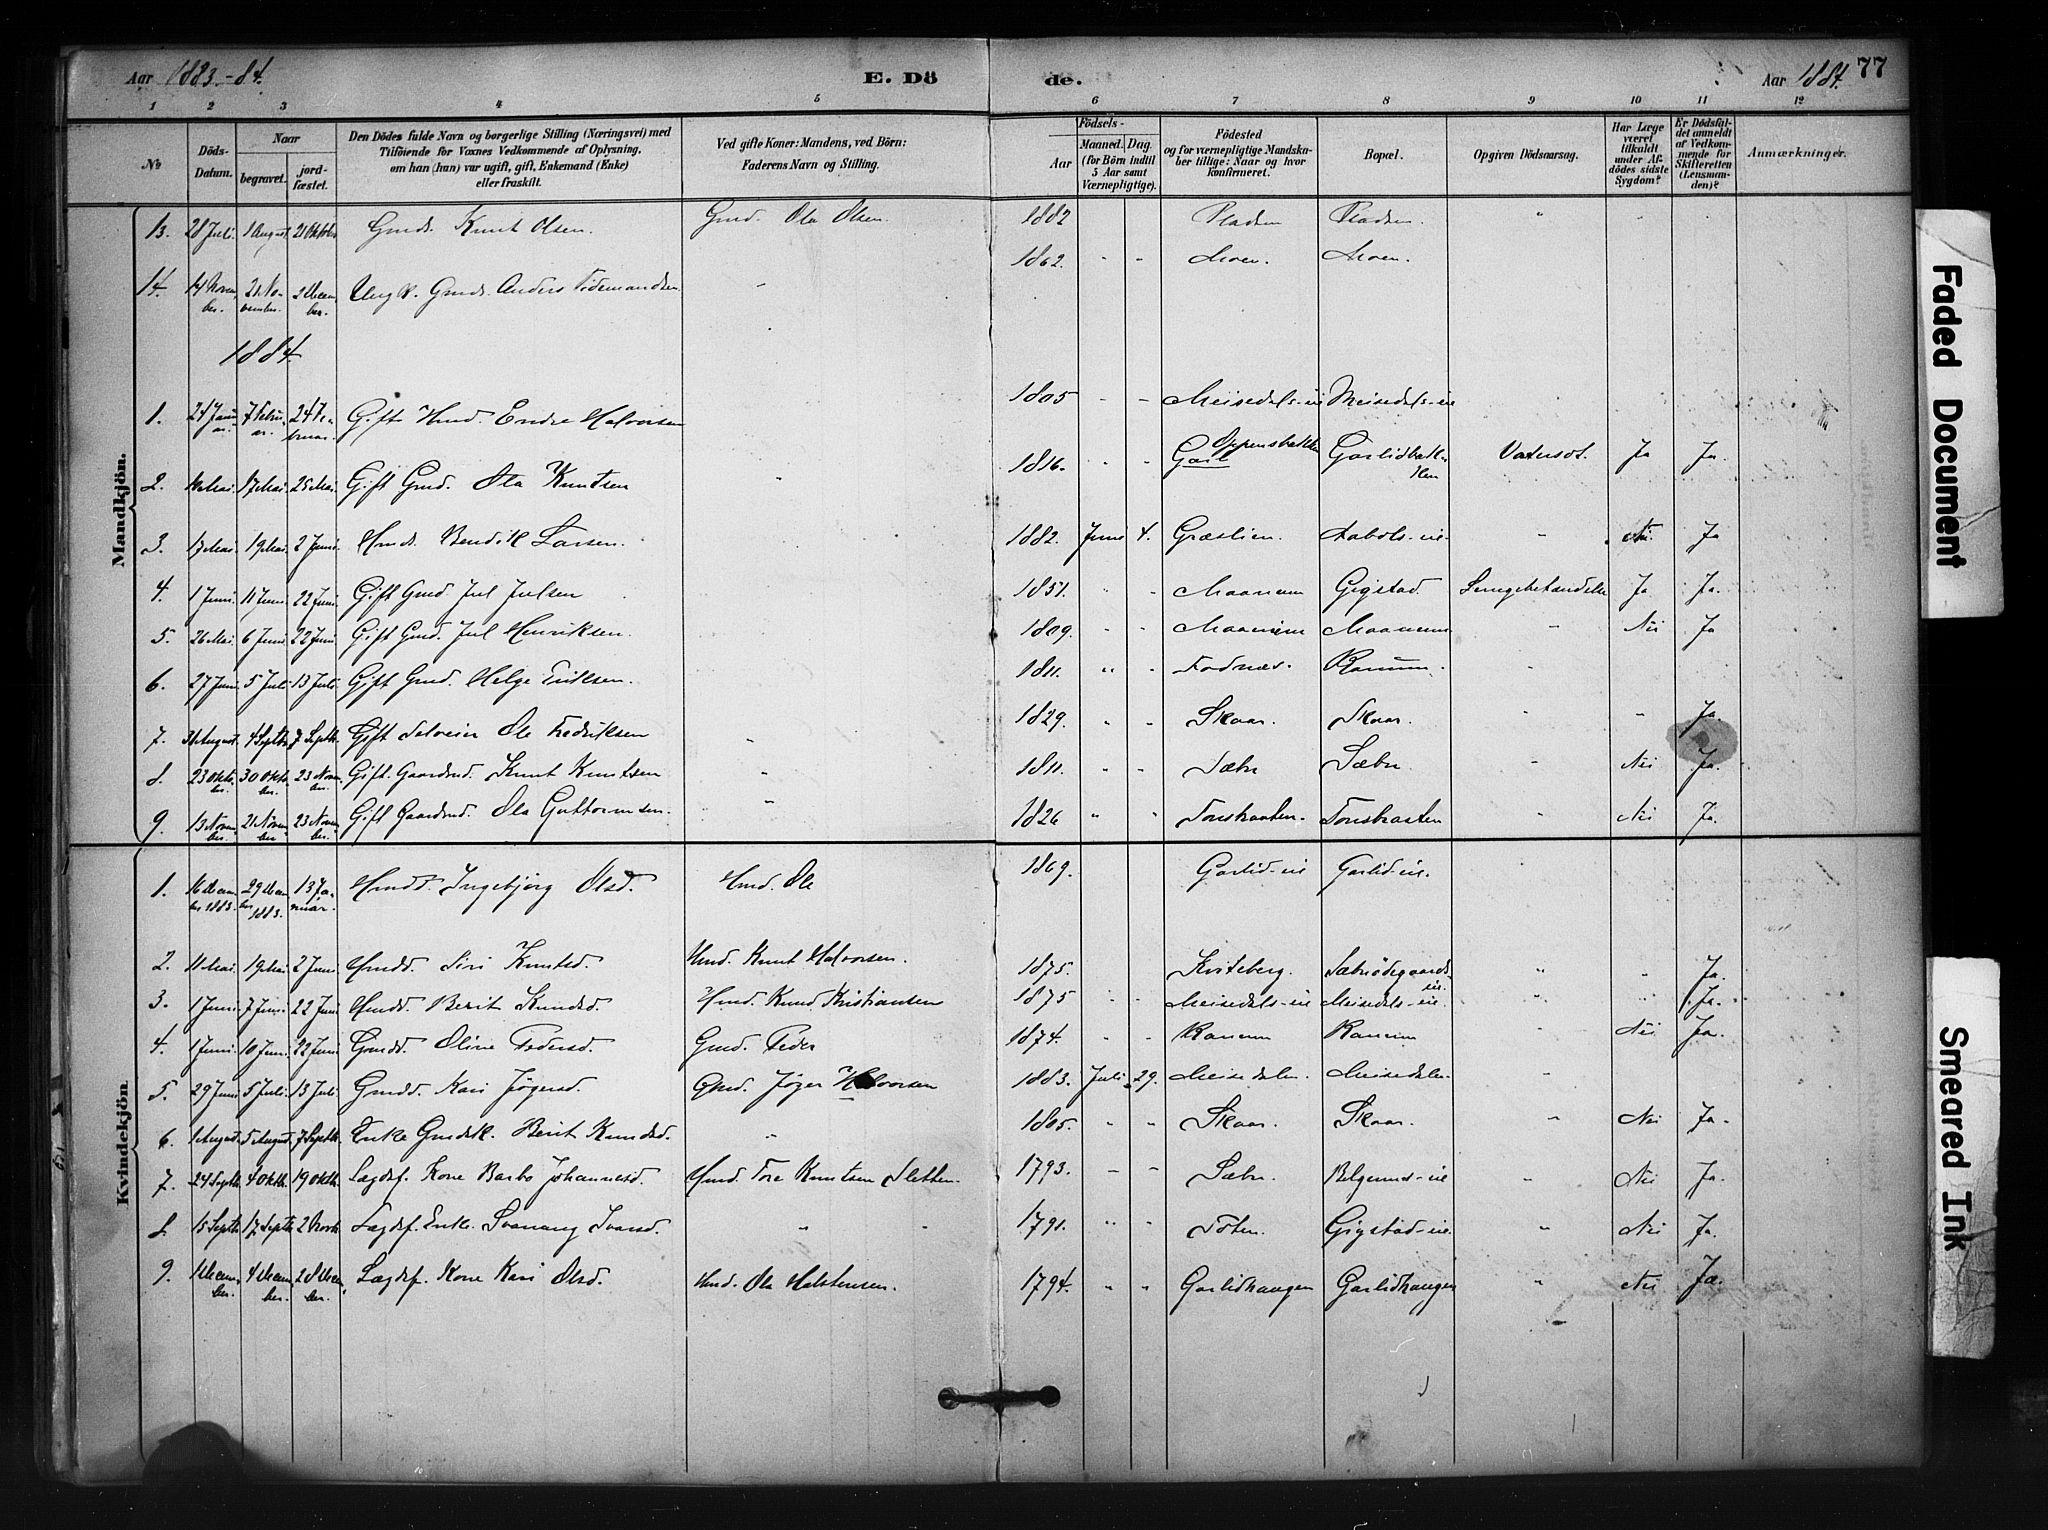 SAH, Nord-Aurdal prestekontor, Ministerialbok nr. 12, 1883-1895, s. 77